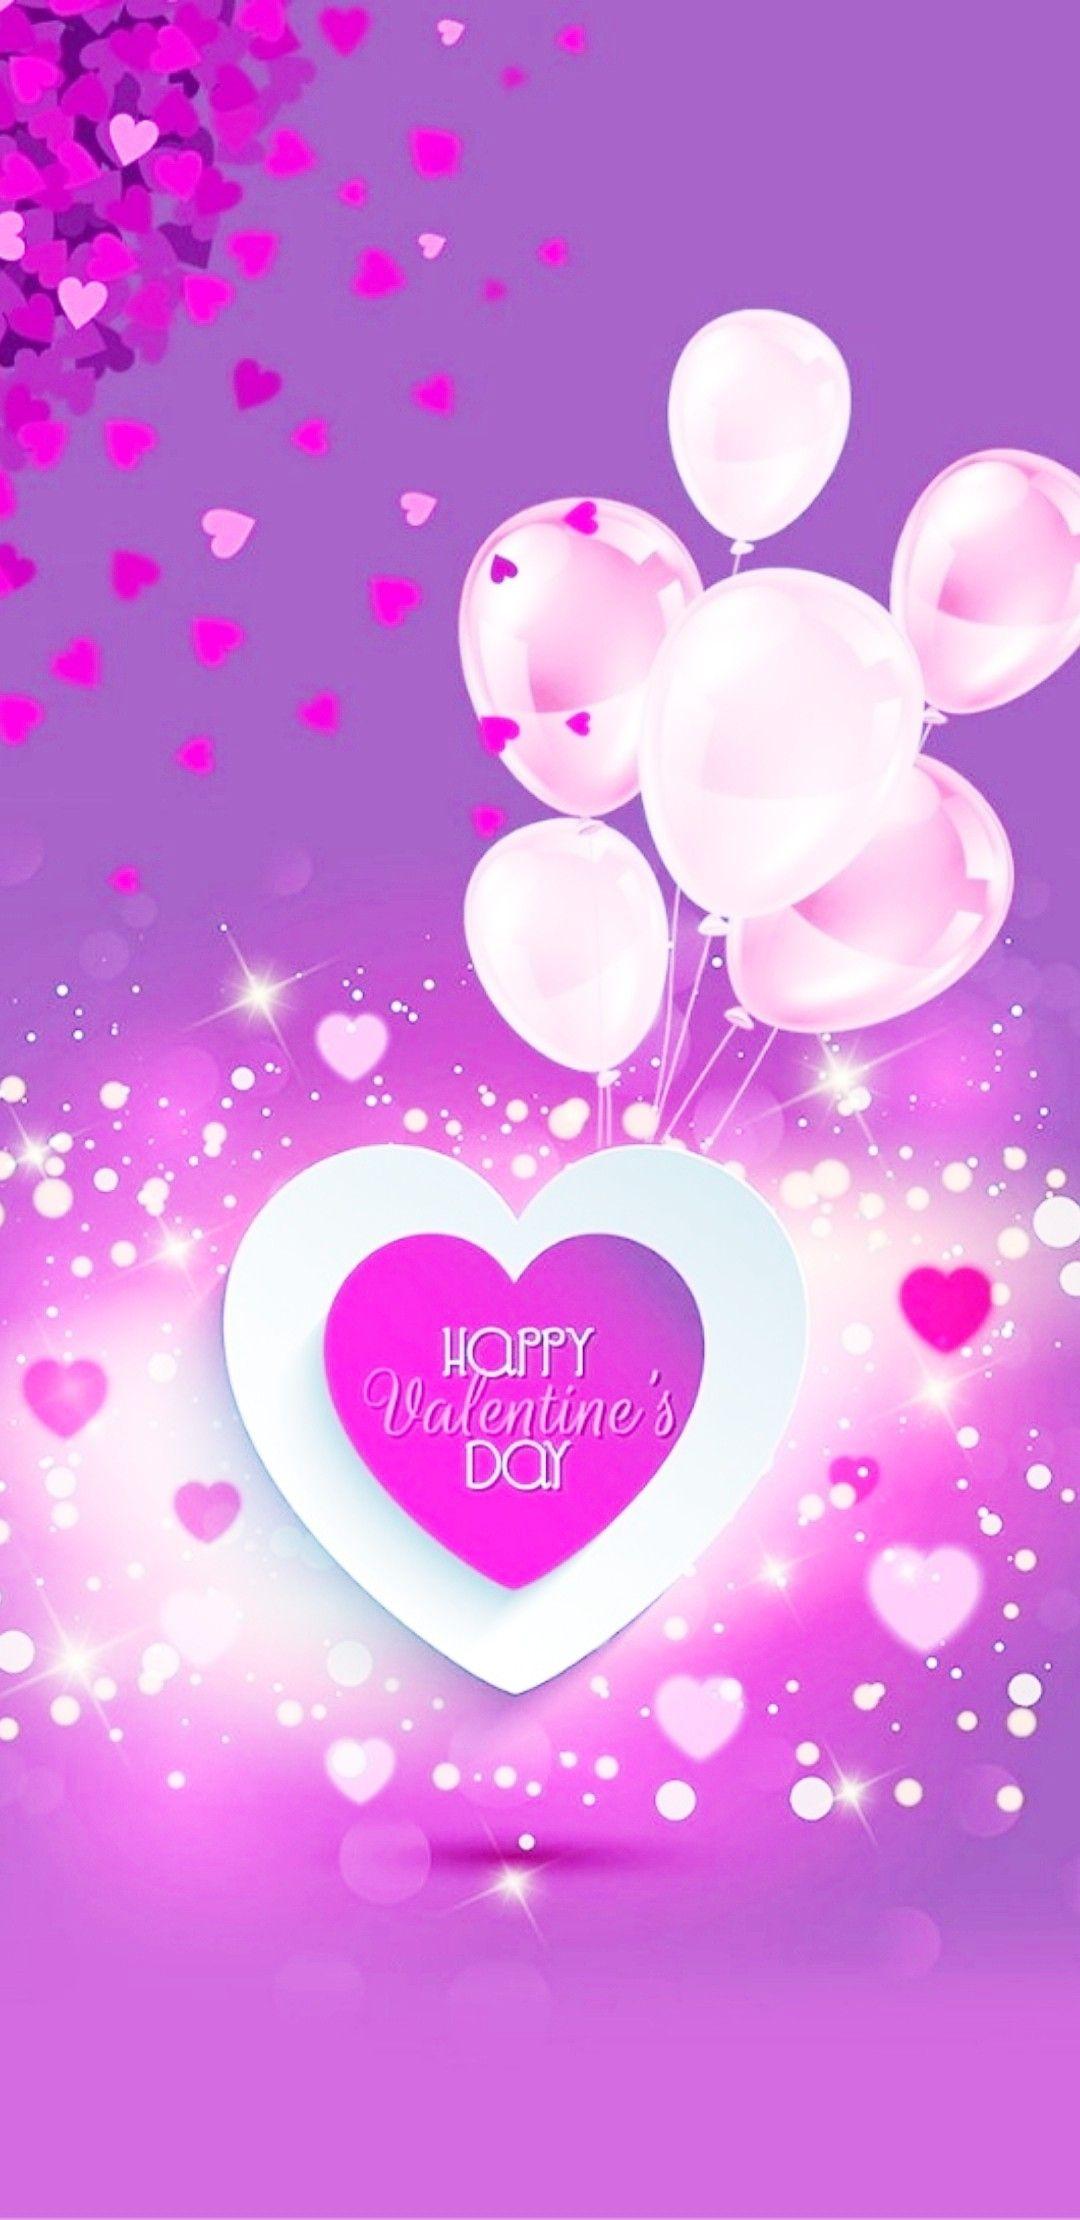 Happy Valentine S Day Valentines Wallpaper Pink Wallpaper Iphone Iphone Wallpaper Glitter Lock screen iphone cute valentines day